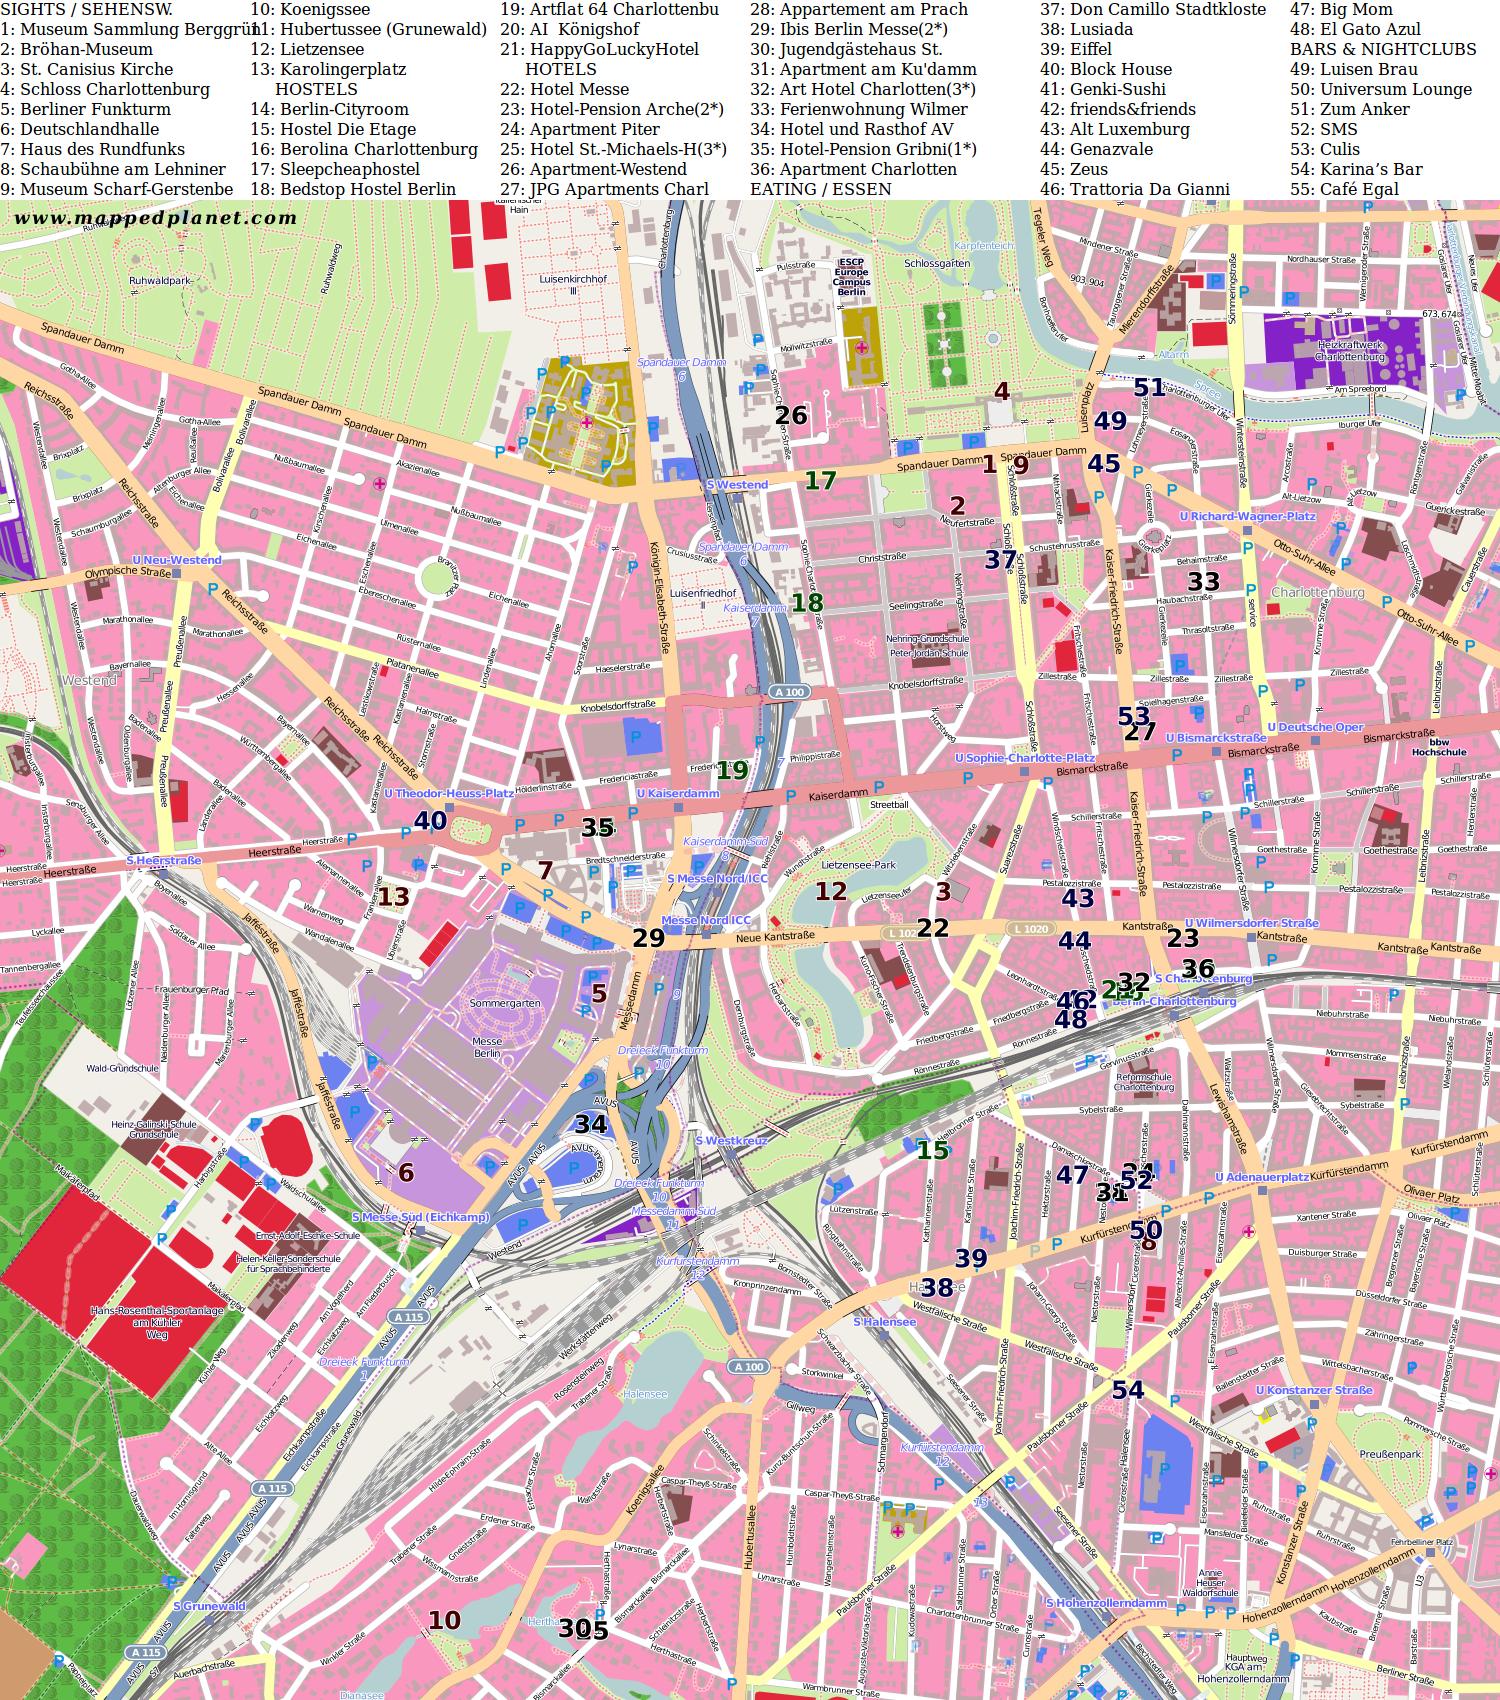 Category 2017 post navigation s damerika karte fl sse parkraumbewirtschaftung berlin mitte